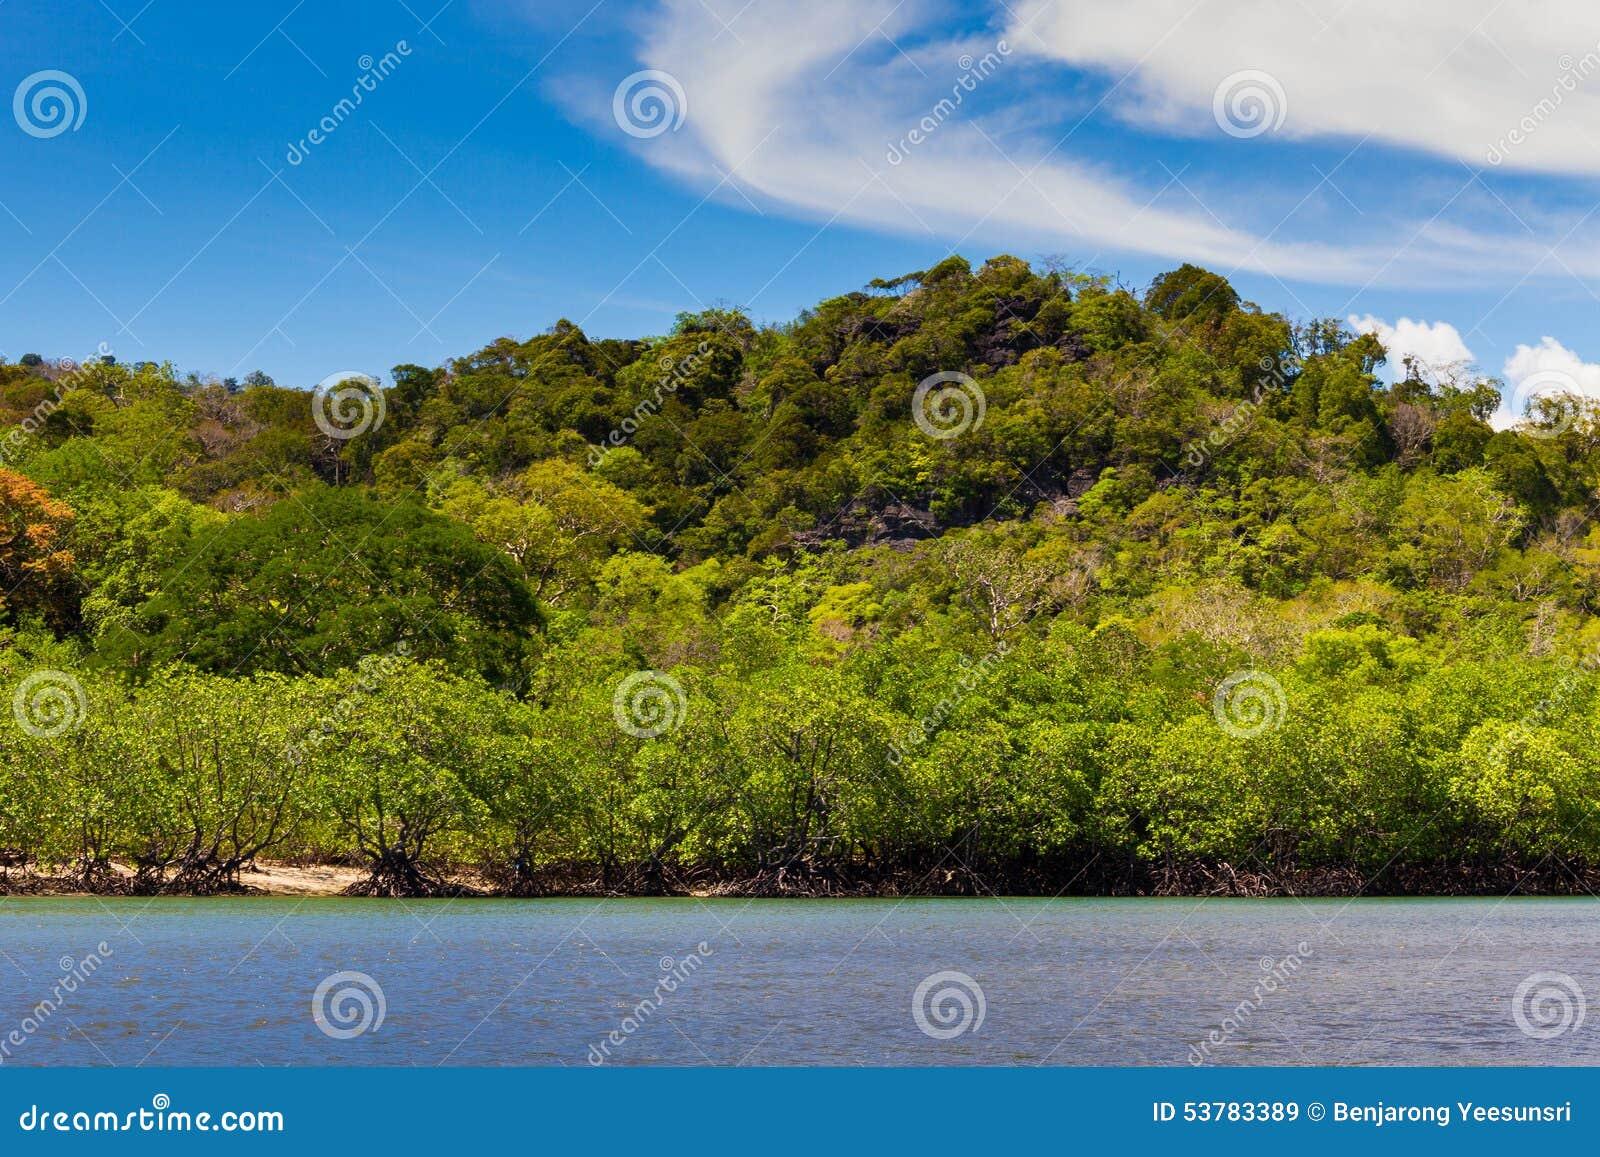 Ravee wyspa, Koh Ravee, Satun prowincja Tajlandia